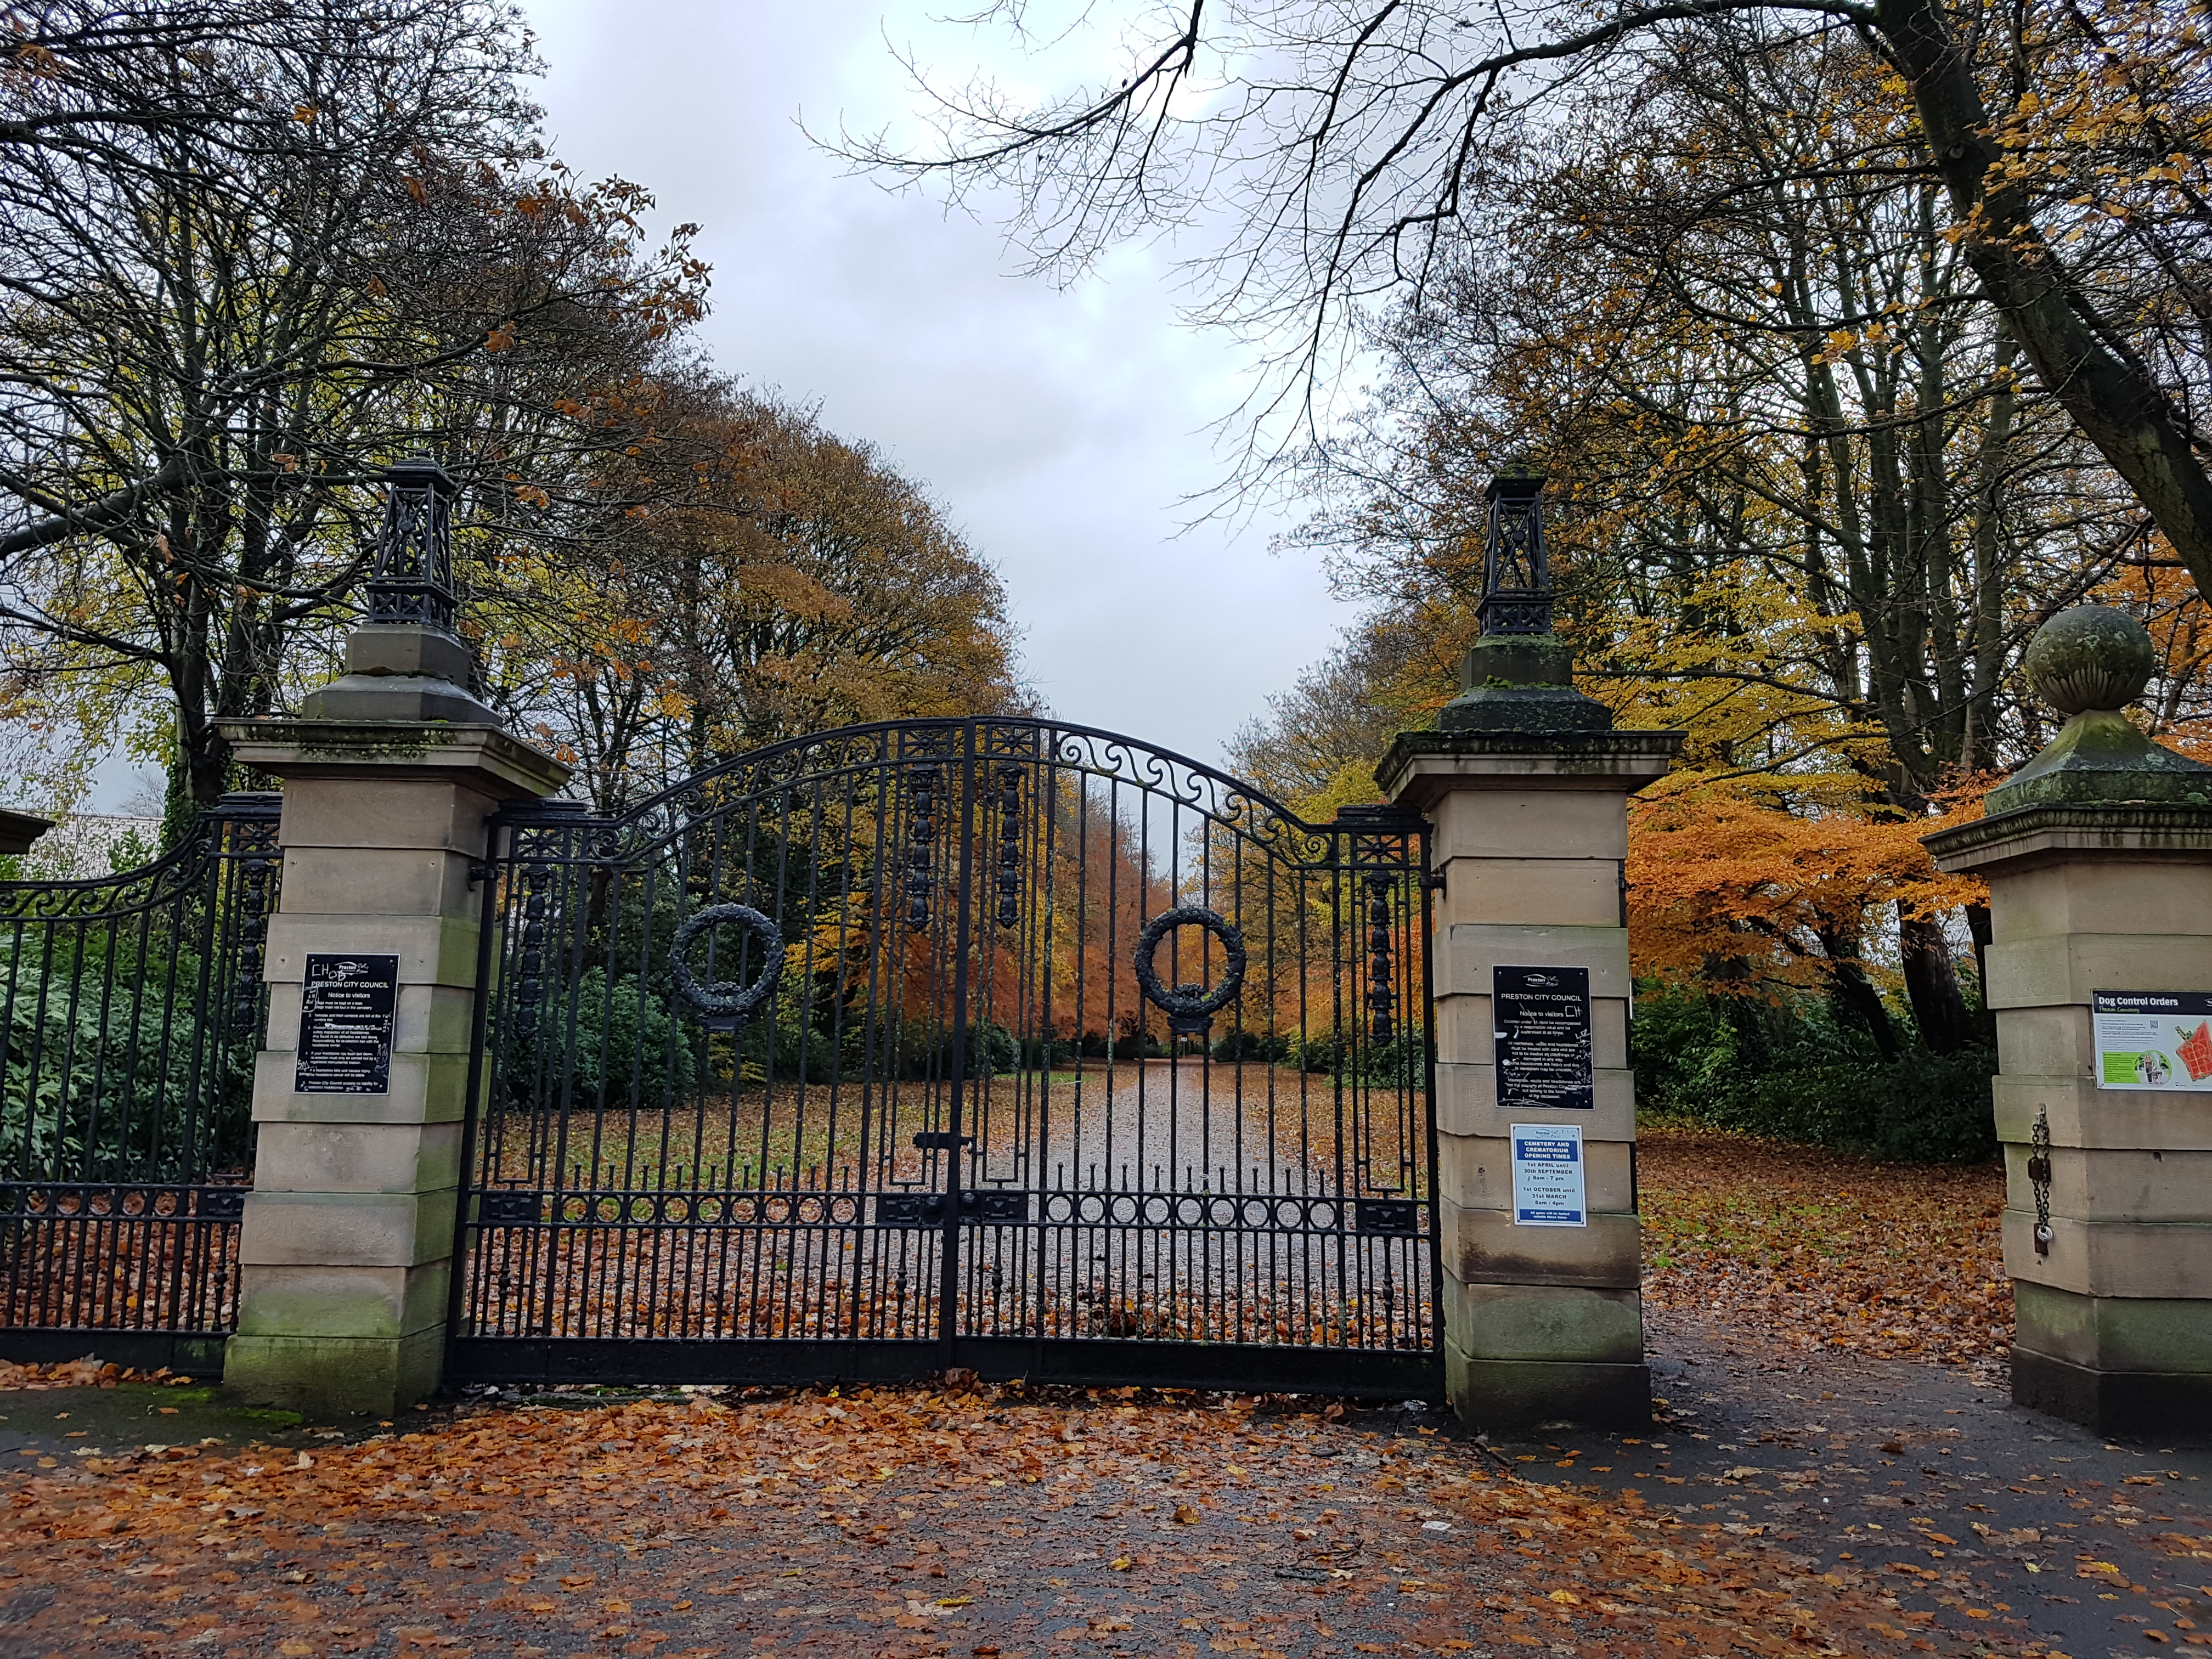 preston cemetery lancashire